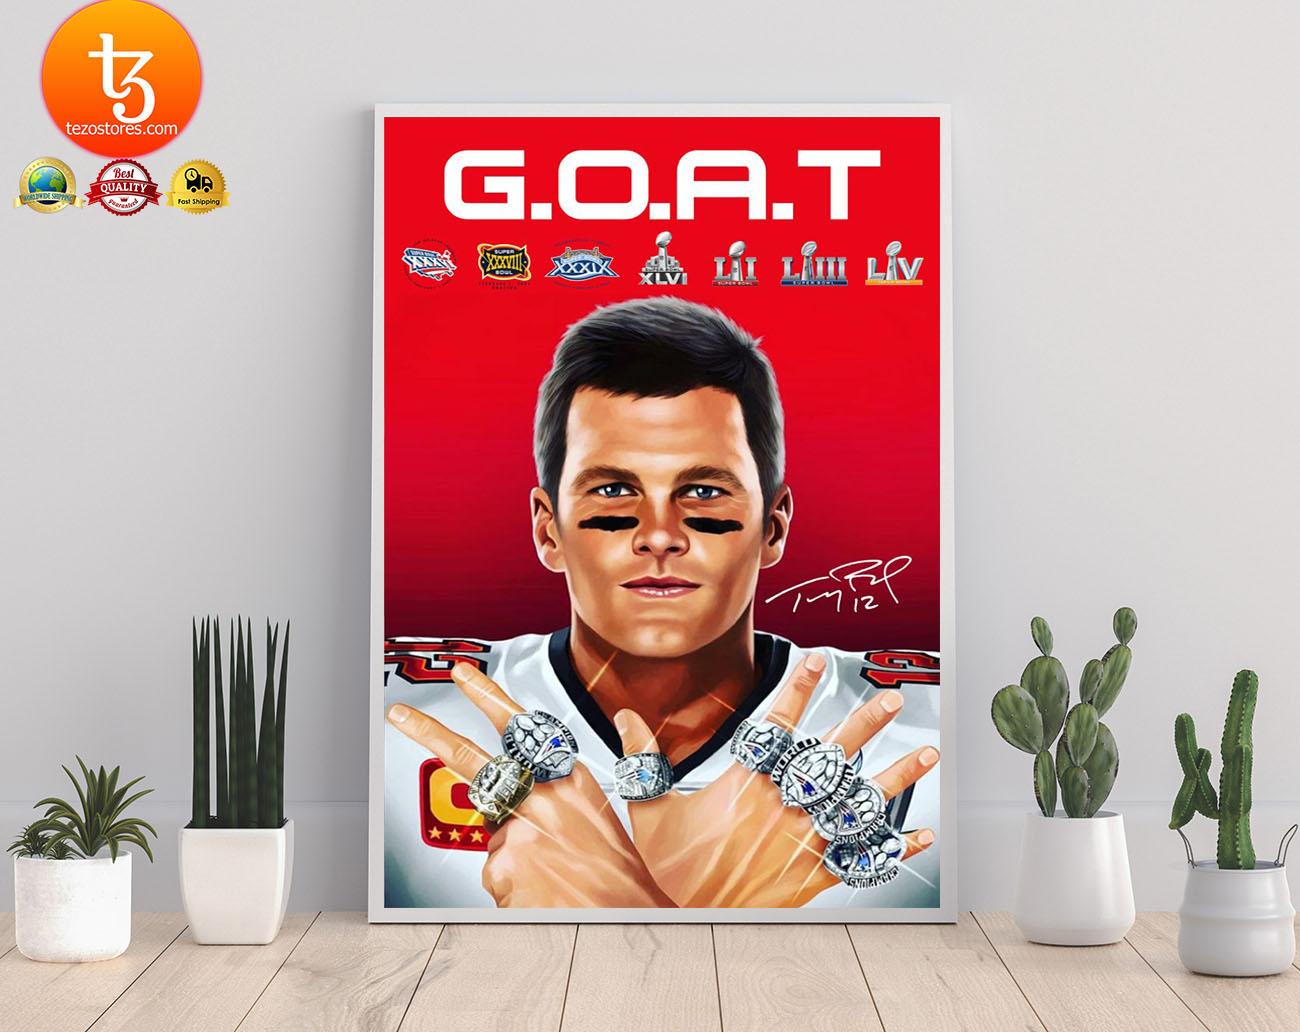 GOAT brady 2021 poster